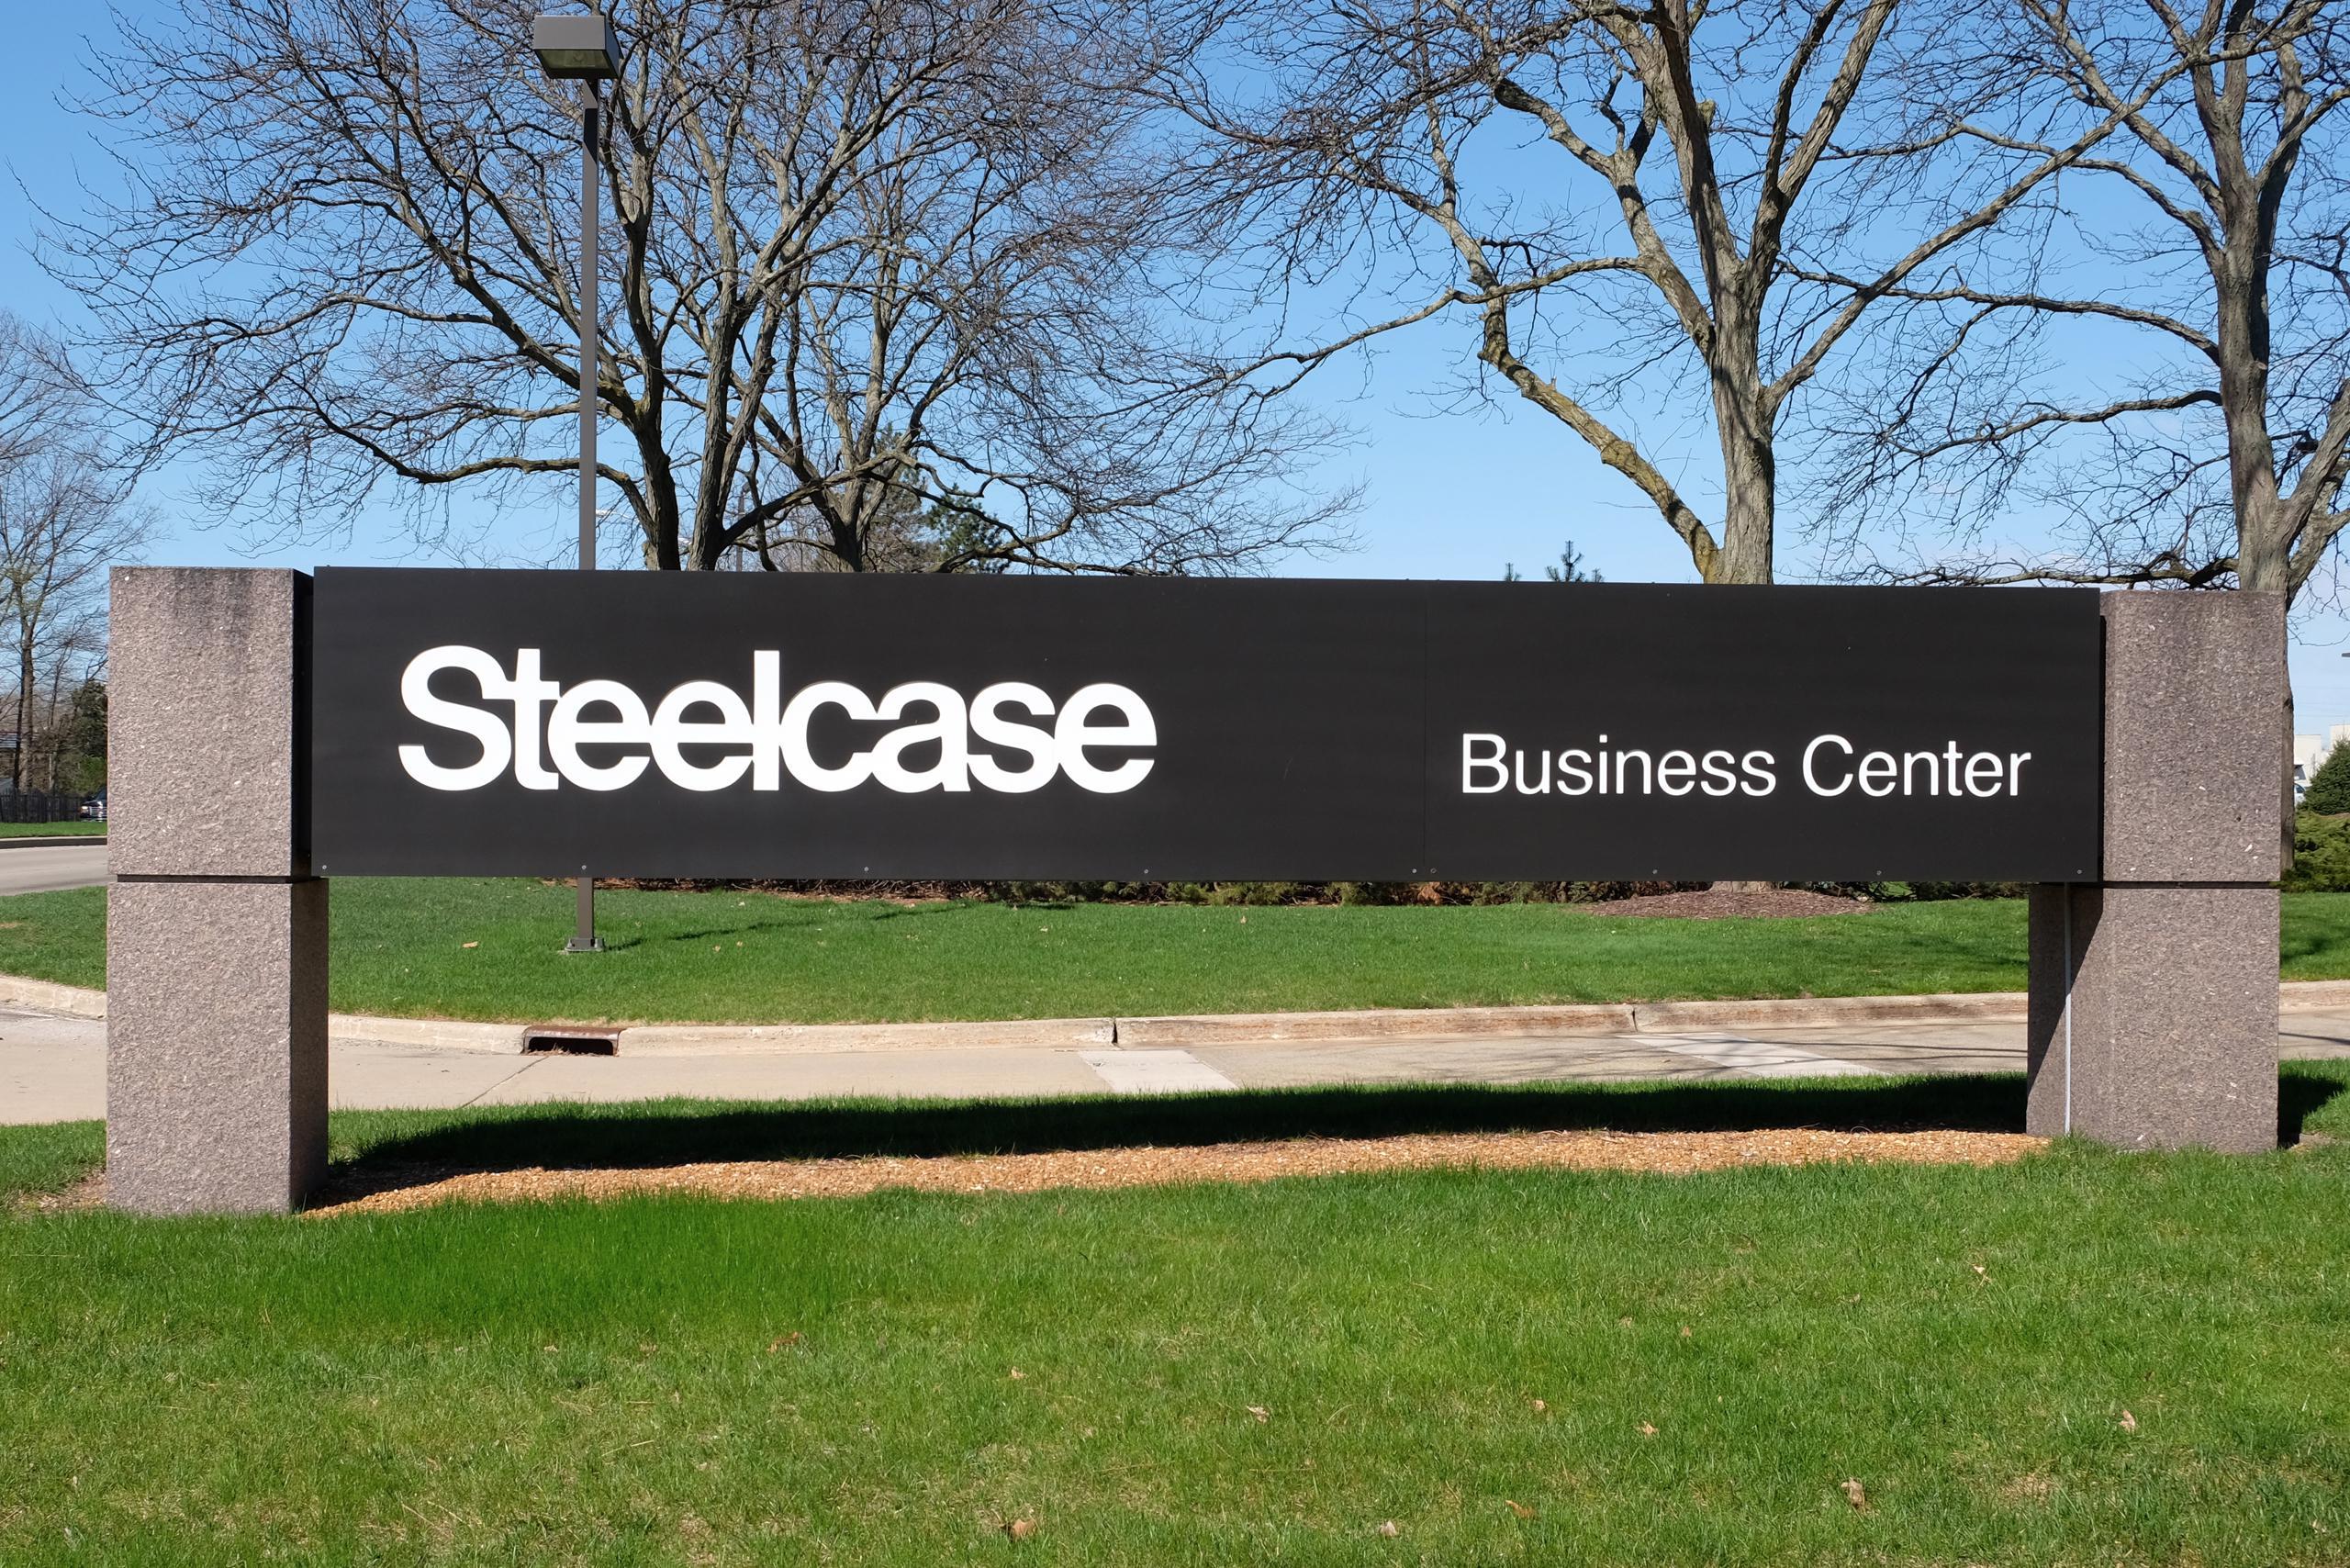 Entrance to Steelcase's corporate headquarters in Grand Rapids, Michigan.